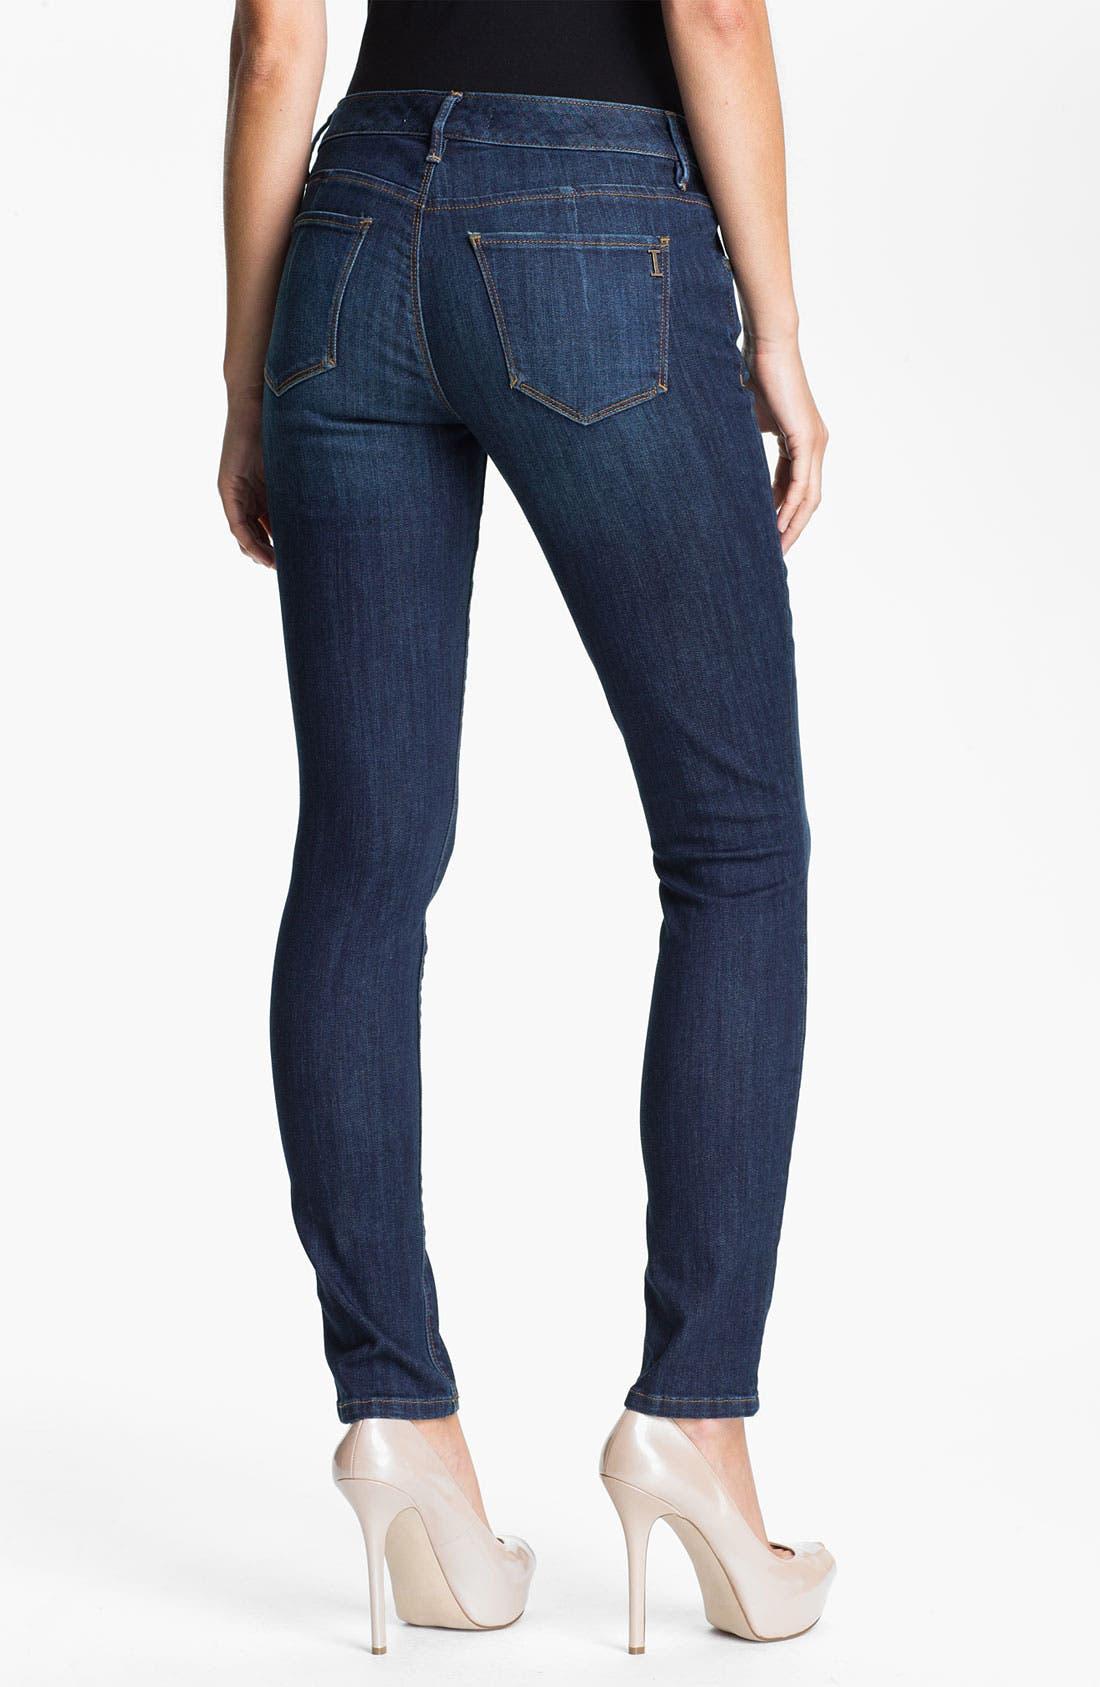 Alternate Image 2  - Isaac Mizrahi Jeans 'Samantha' Skinny Jeans